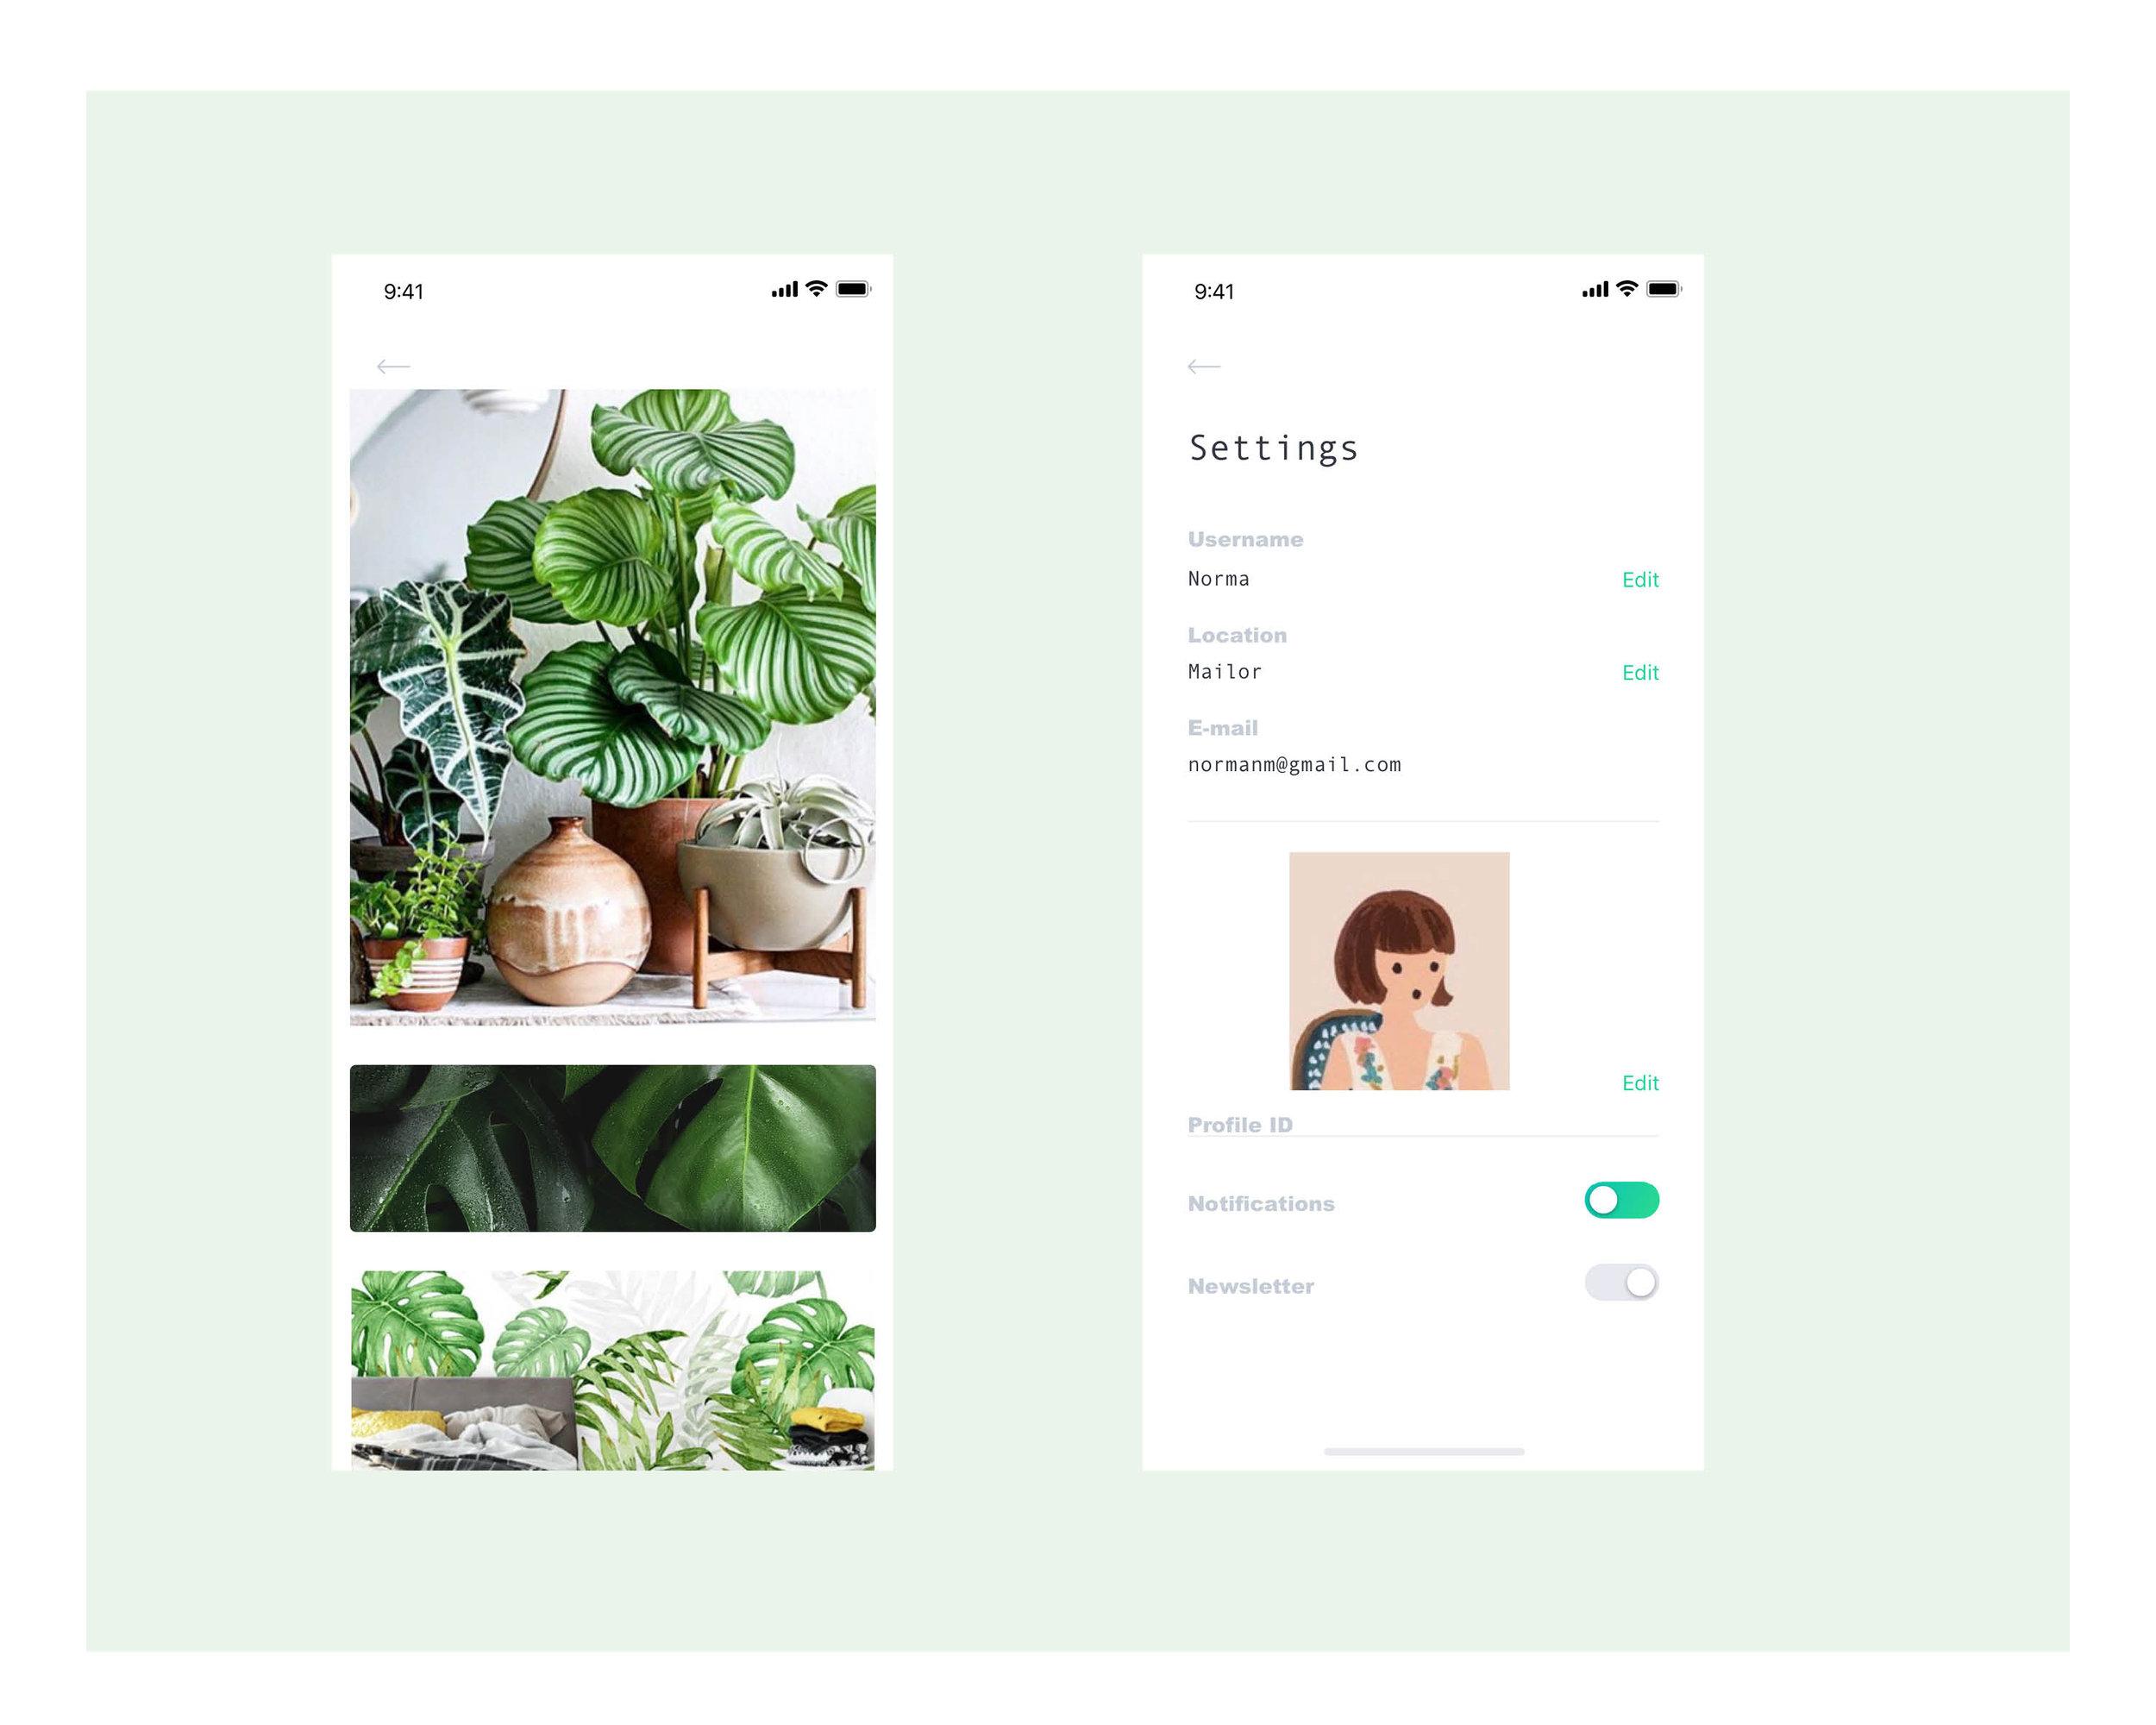 gh-app-spread3.jpg